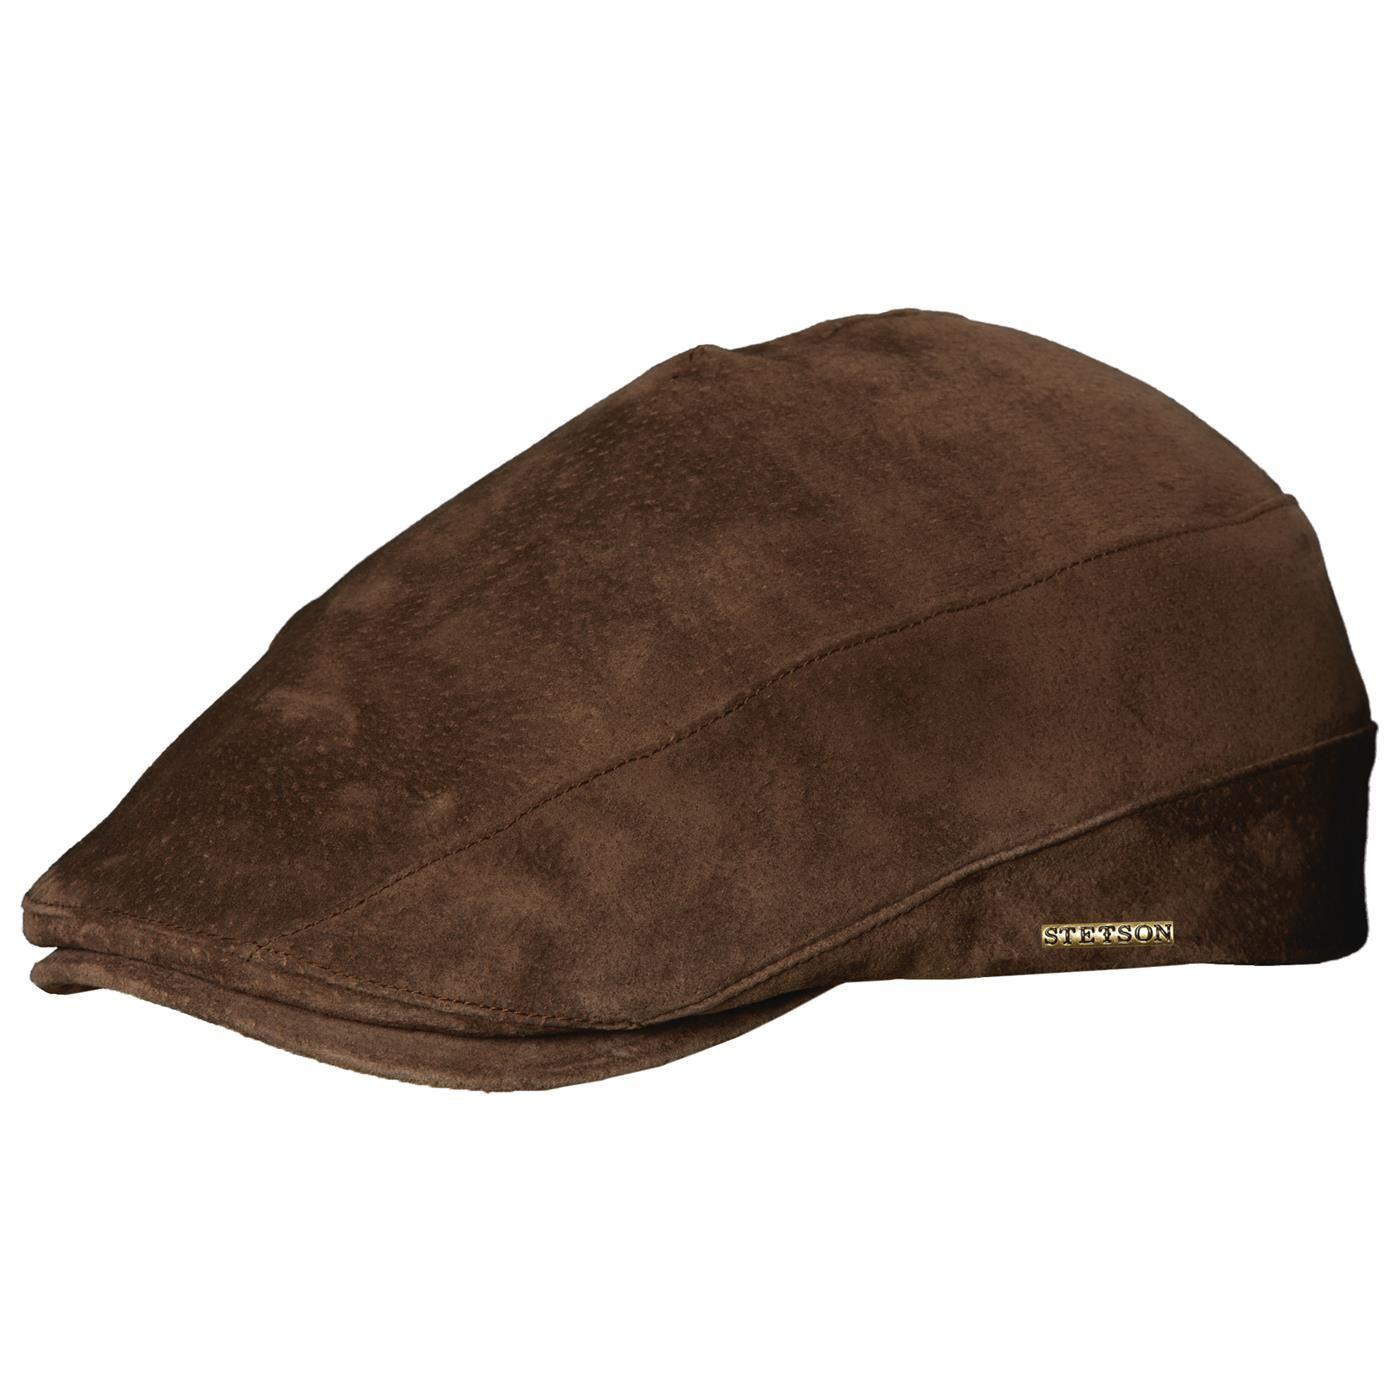 9344fce1 Stetson Men's Genuine Suede Classic Ivy Cap in 2019 | Hats, Hats ...